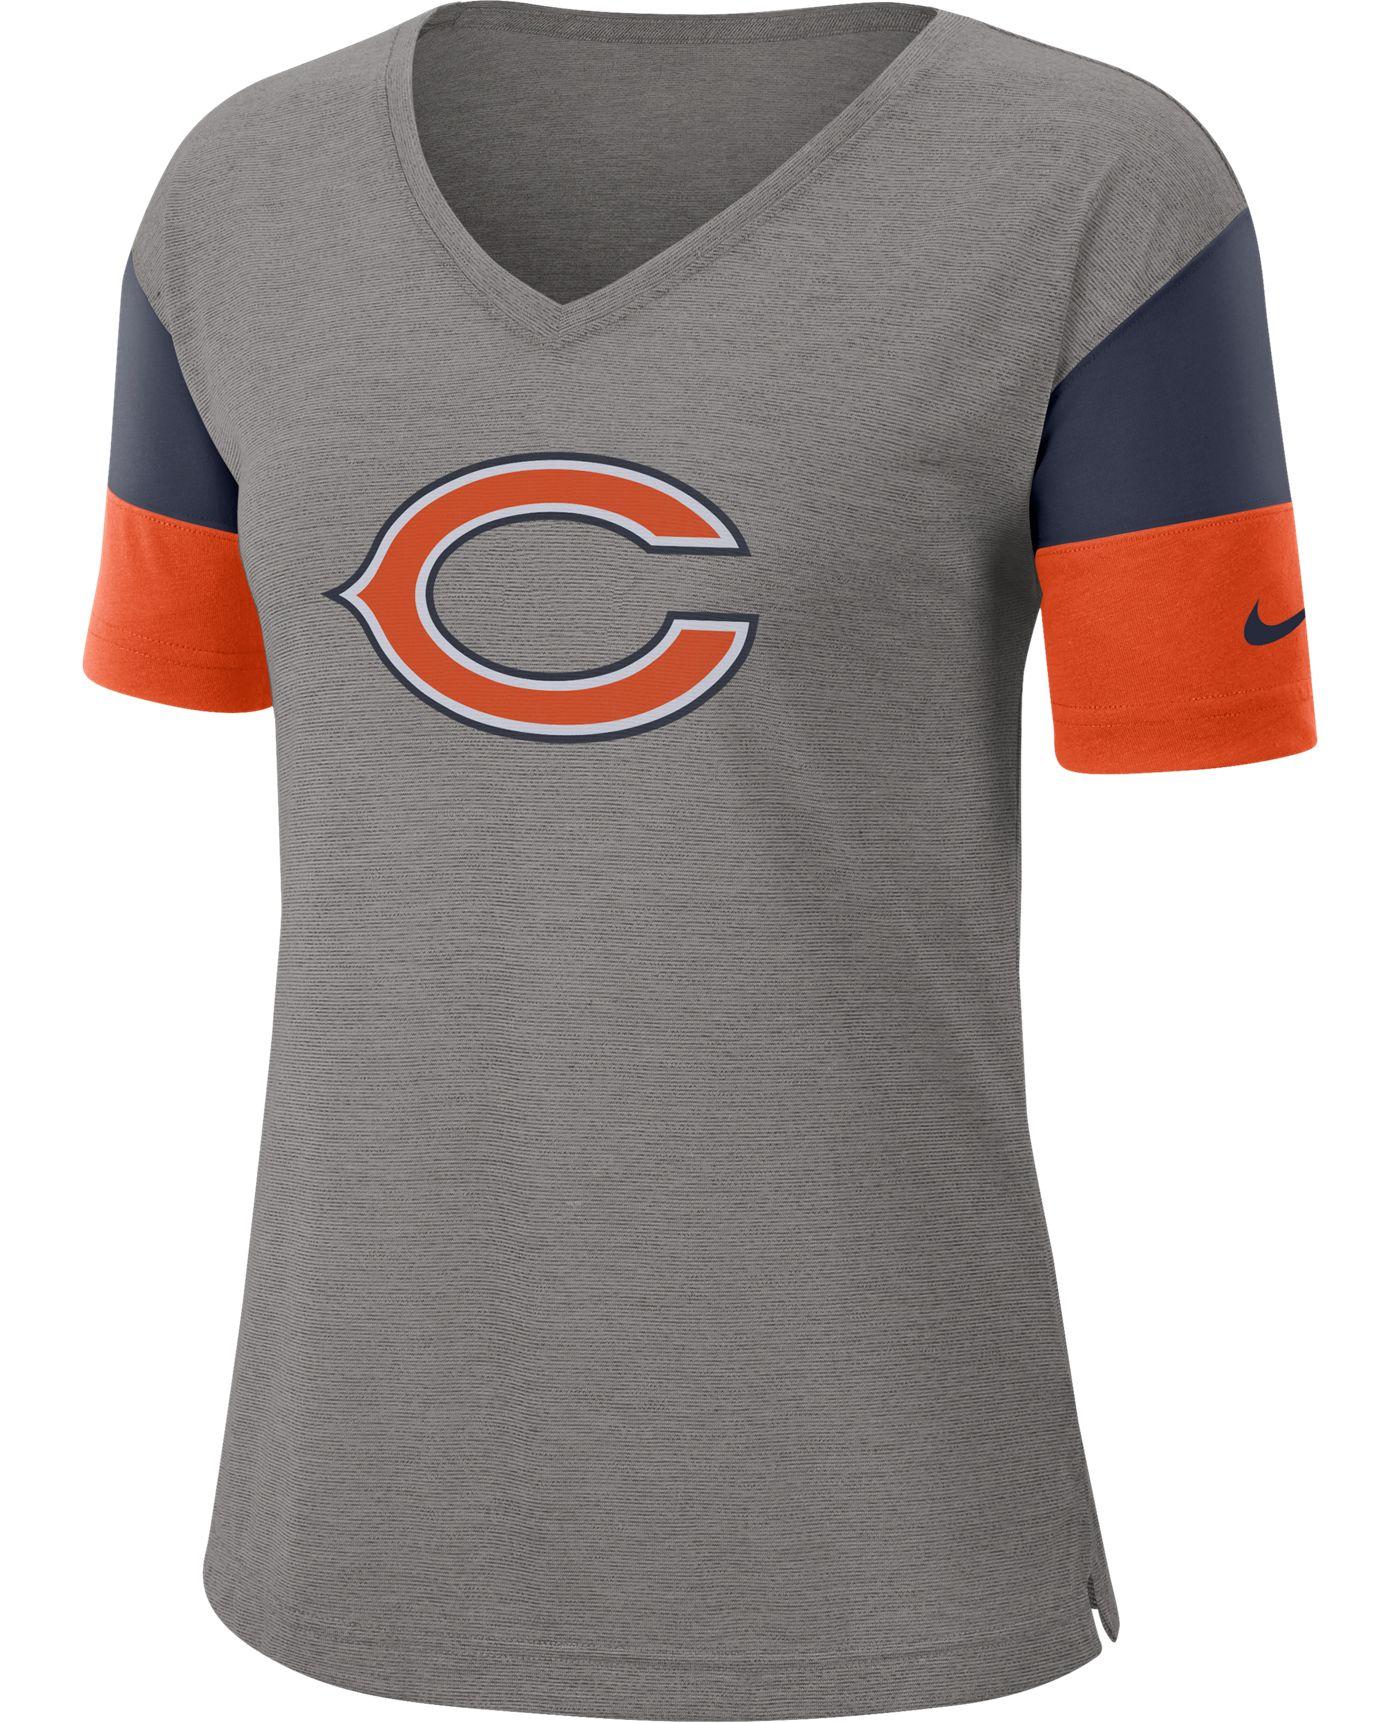 Nike Women's Chicago Bears Breathe Heather Grey V-Neck T-Shirt